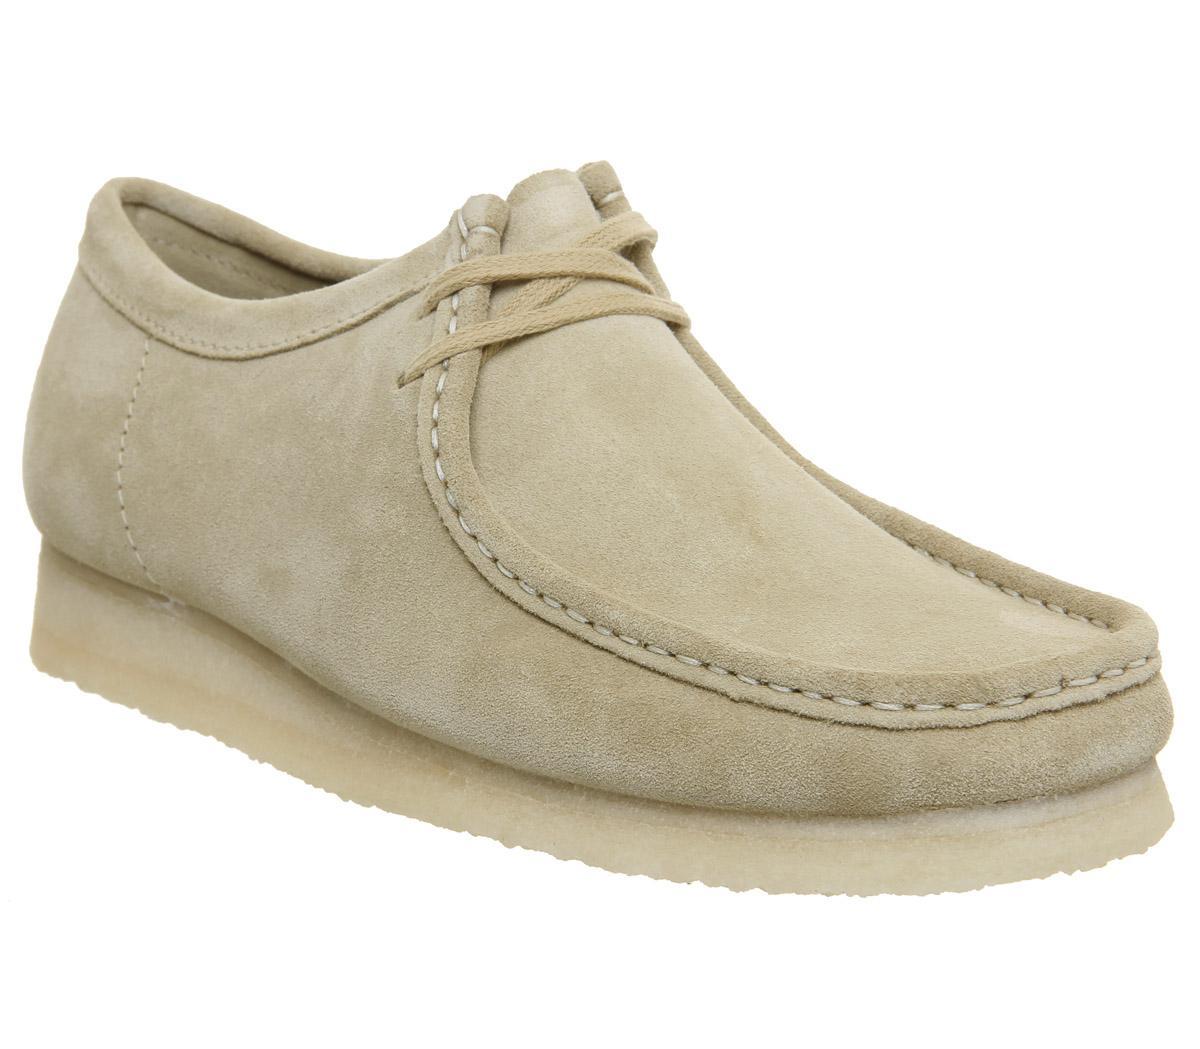 Clarks Originals Wallabee Shoes Maple